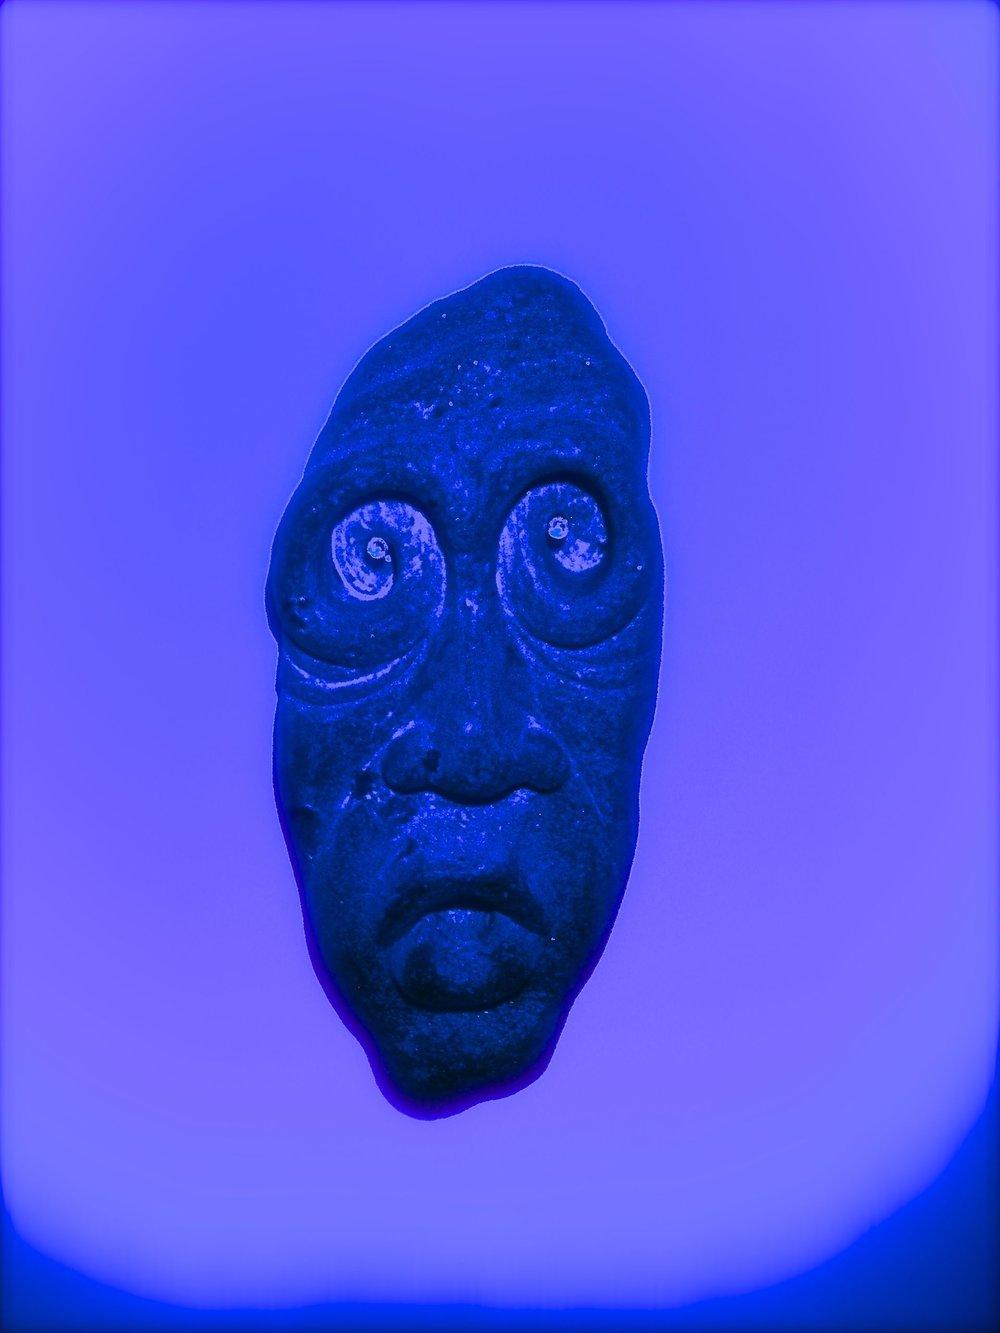 blue mask low res.jpg